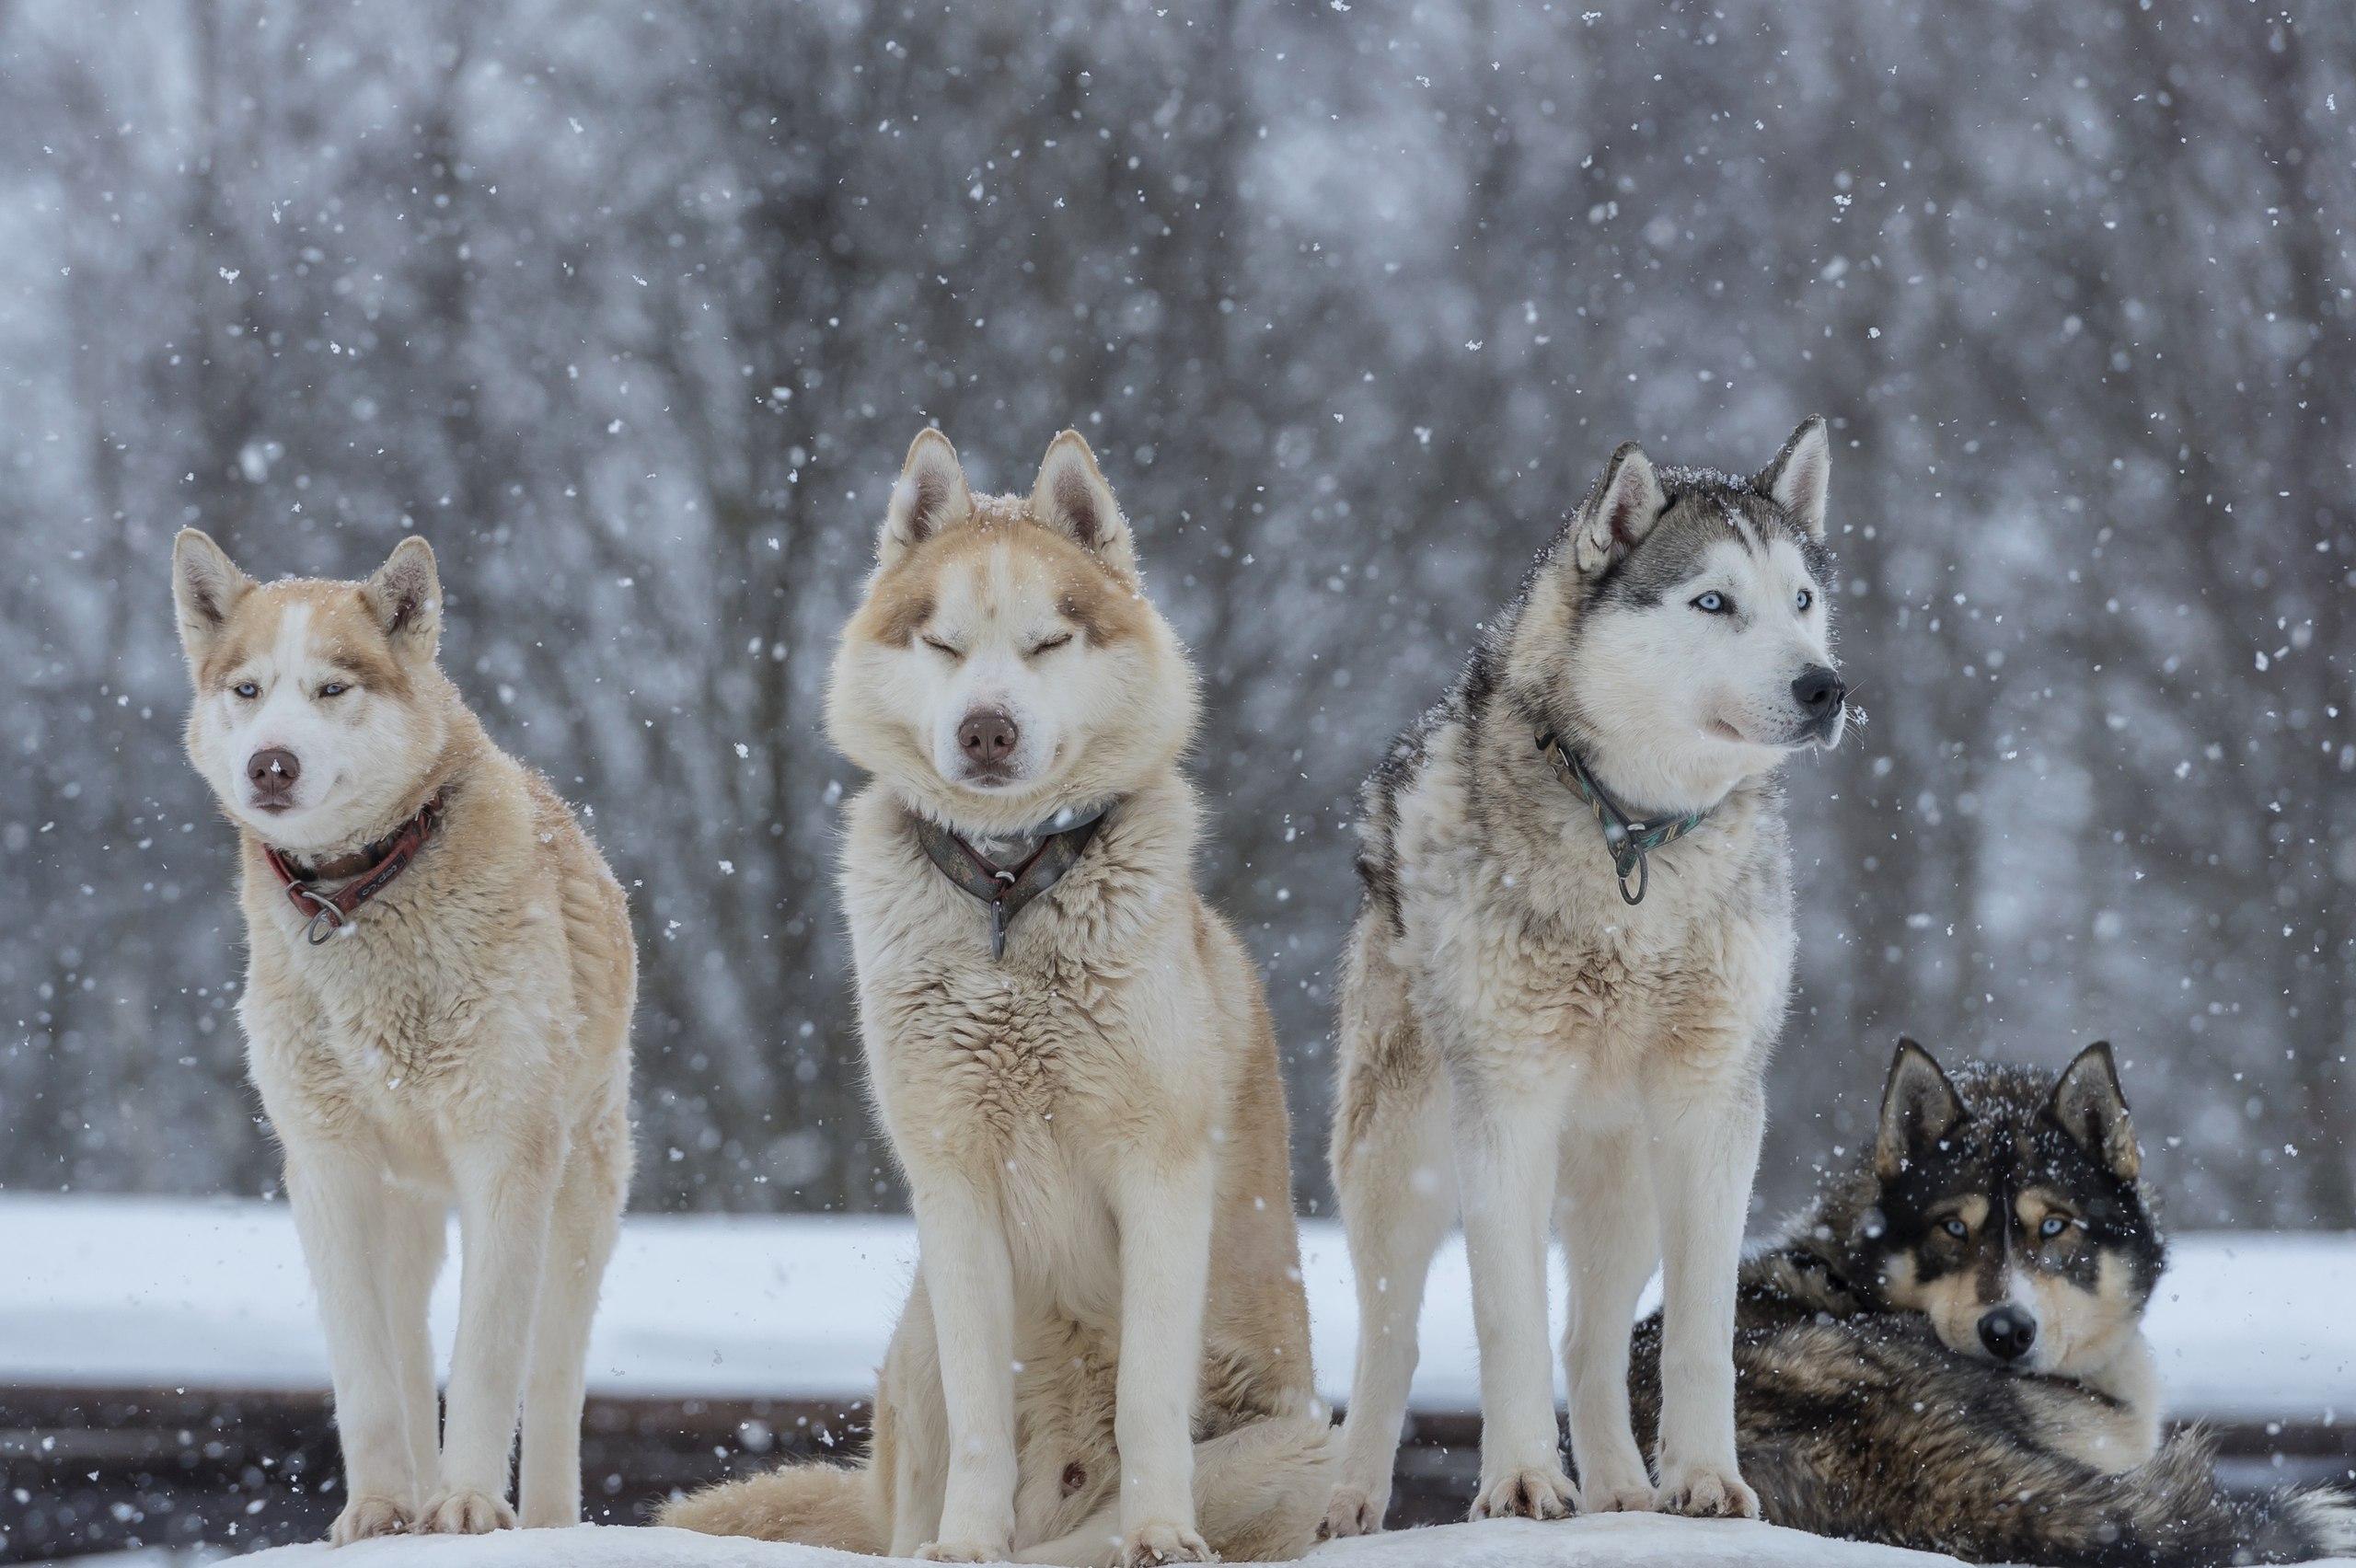 Хаскидеревня «Рузская Аляска»